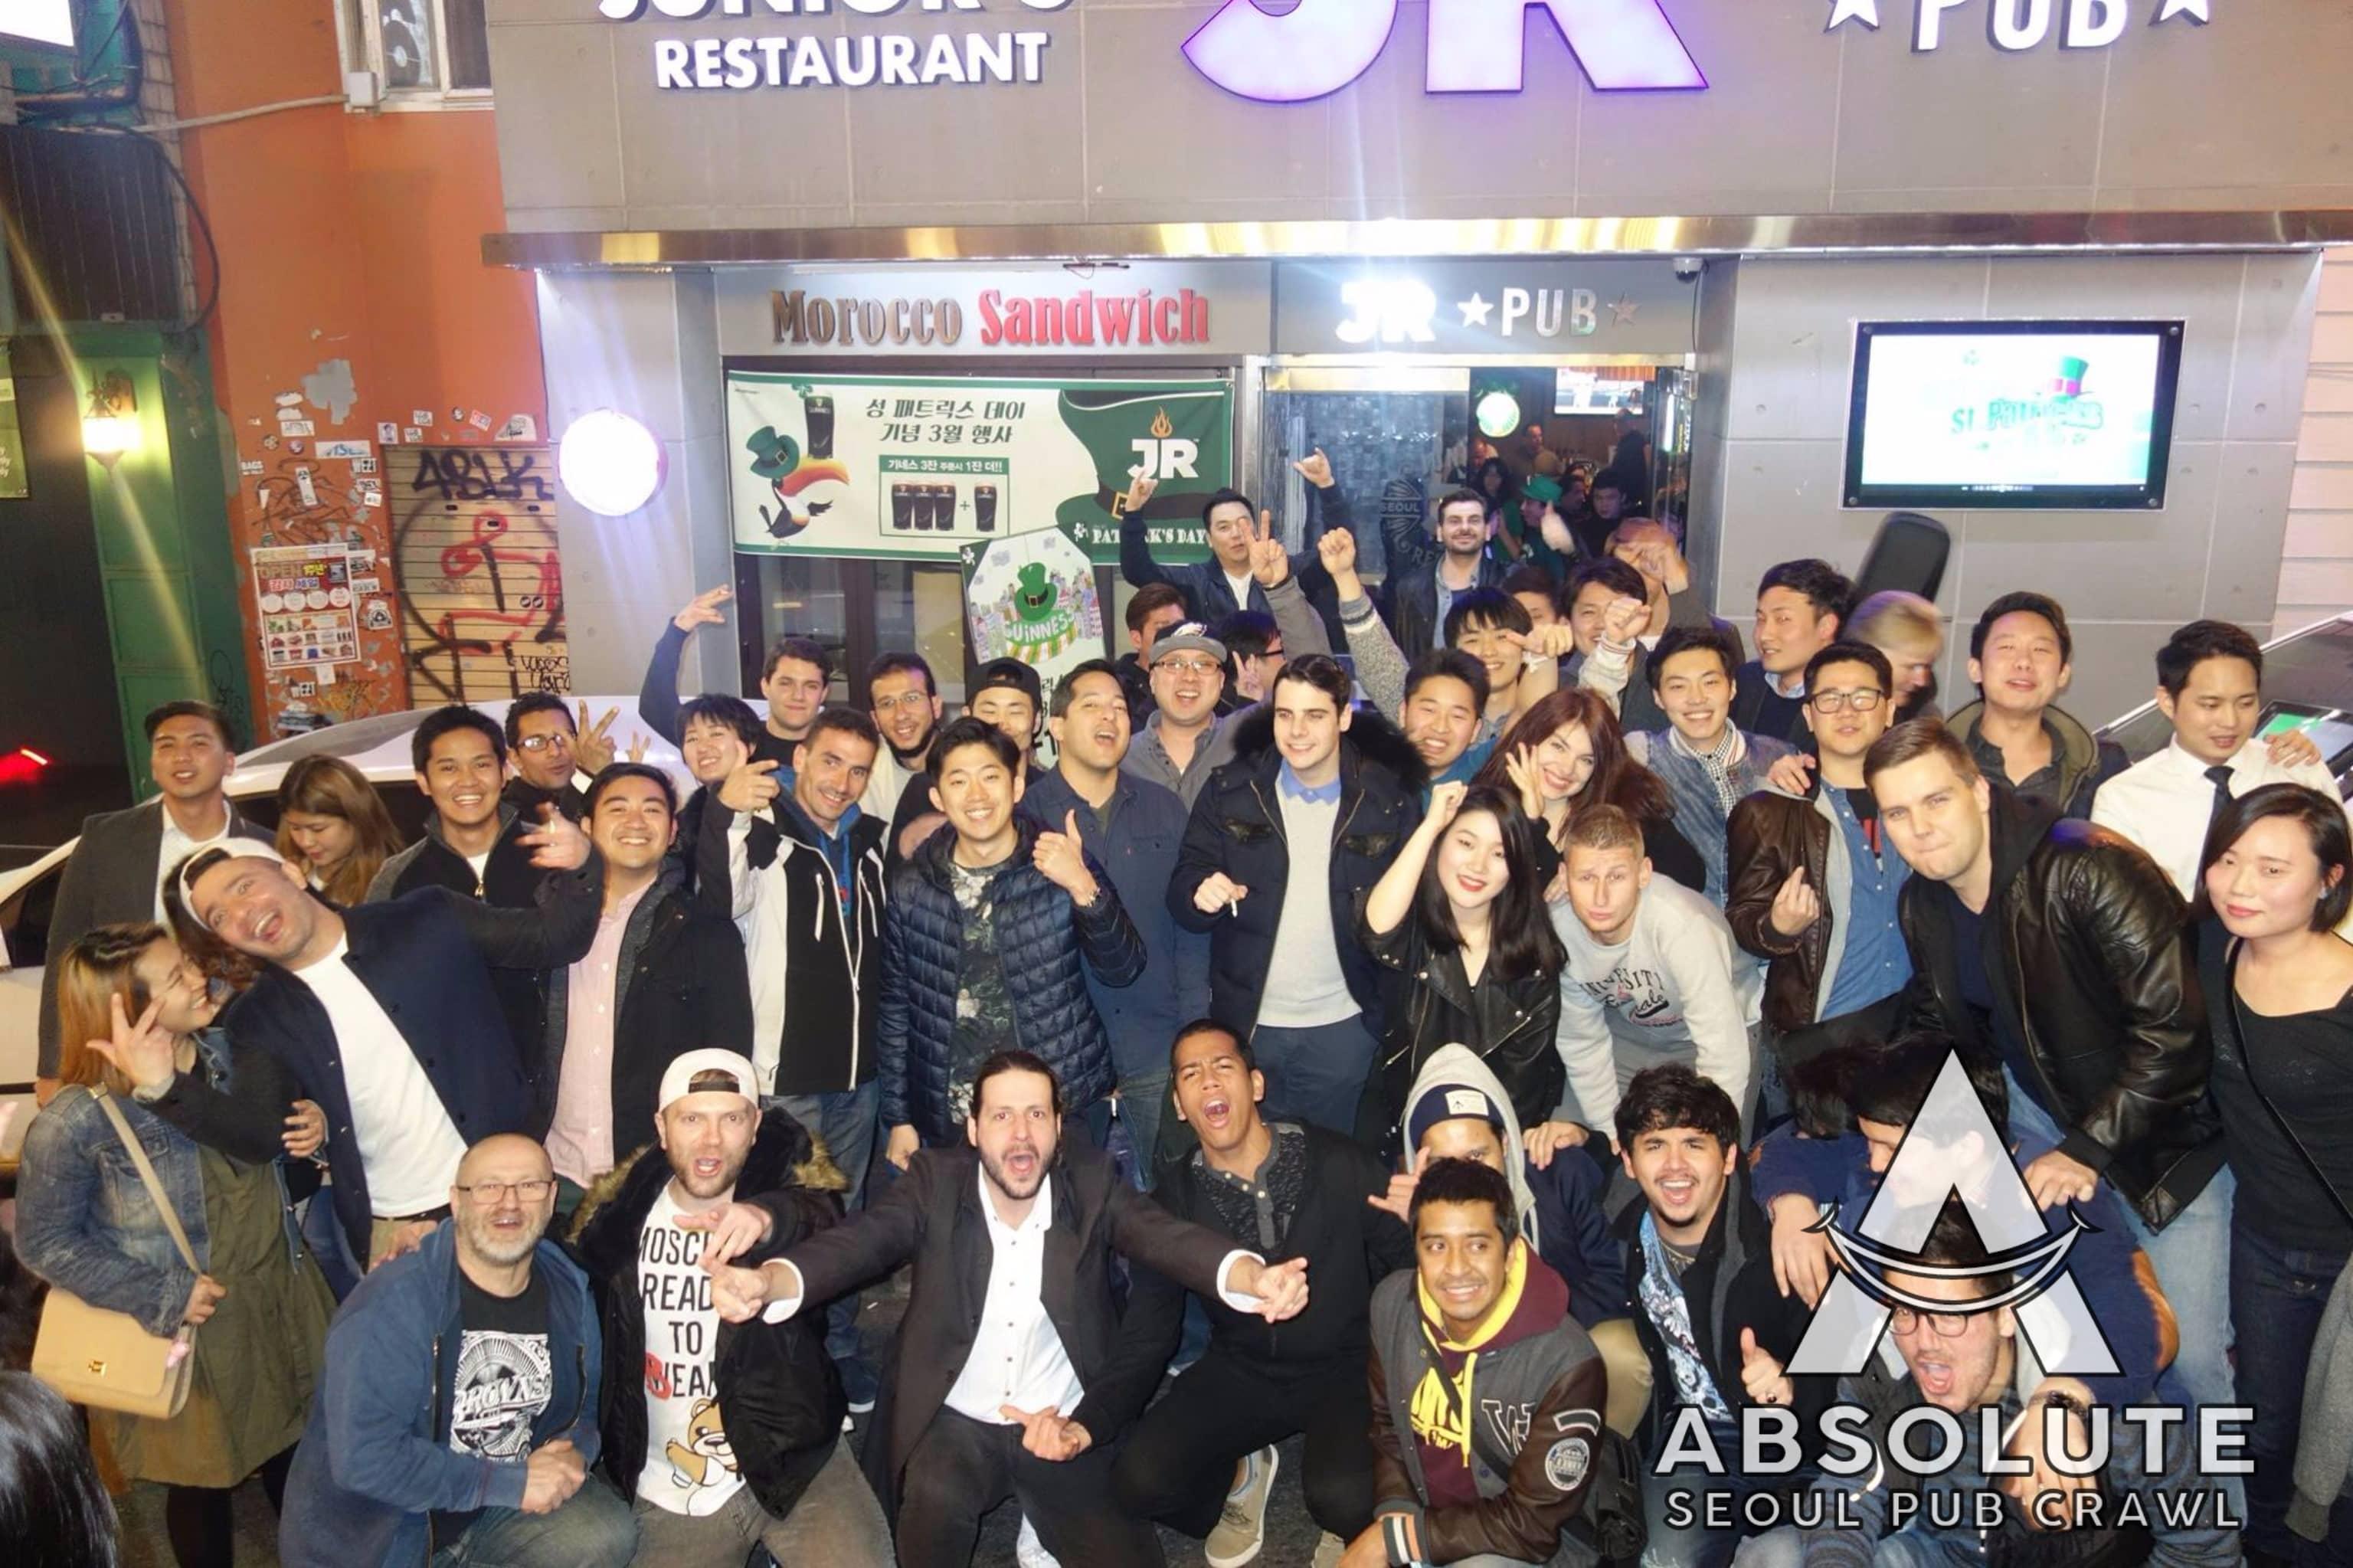 Seoul pub crawl Absolute Korea Hongdae Itaewon Gangnam International Party bar hopping crawlers tour